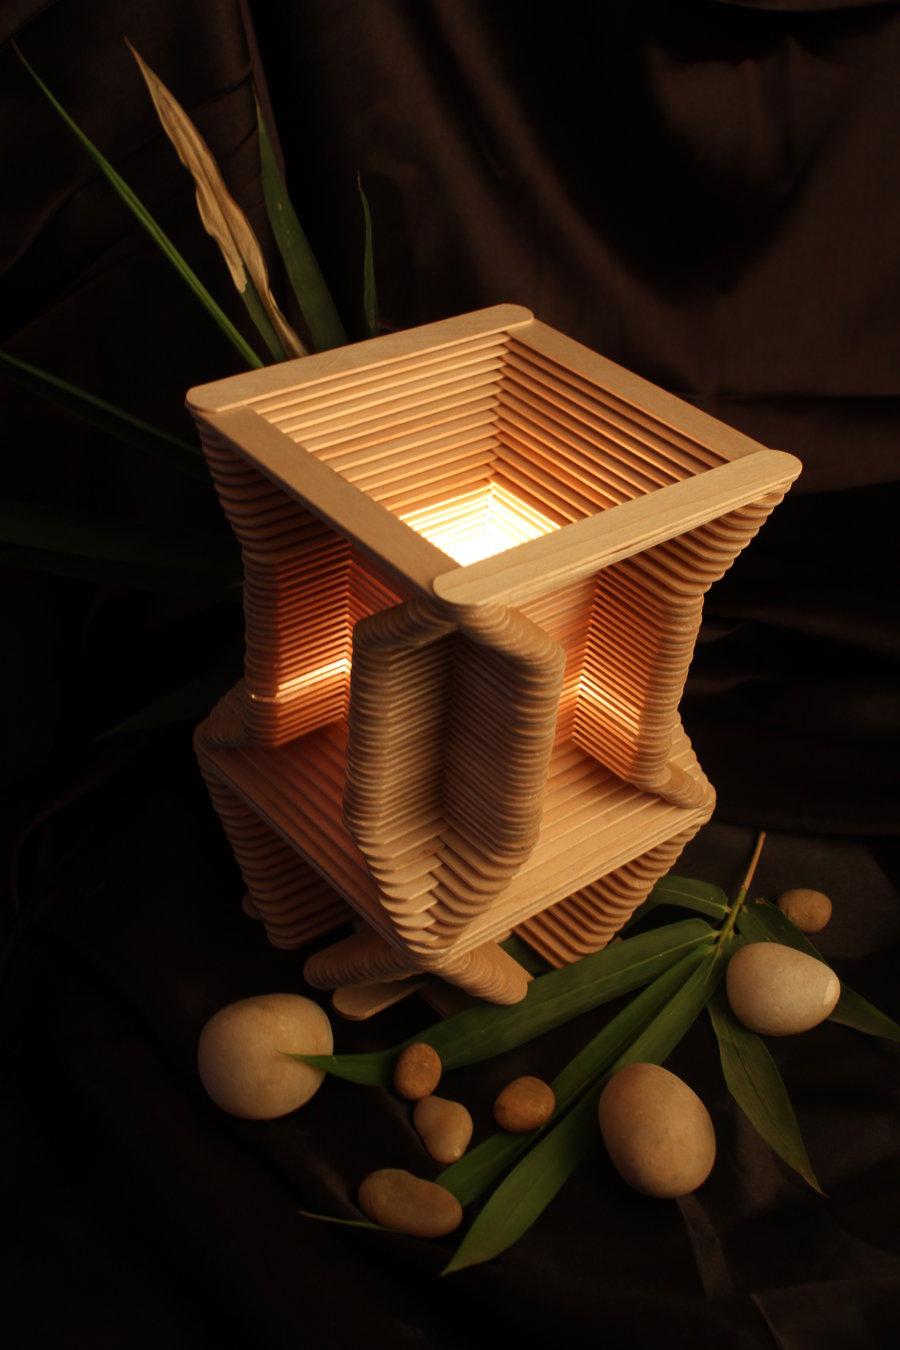 35 Inspirasi Terpopuler Kerajinan Stik Es Krim Lampu Hias Kerajinan stik es krim lampu